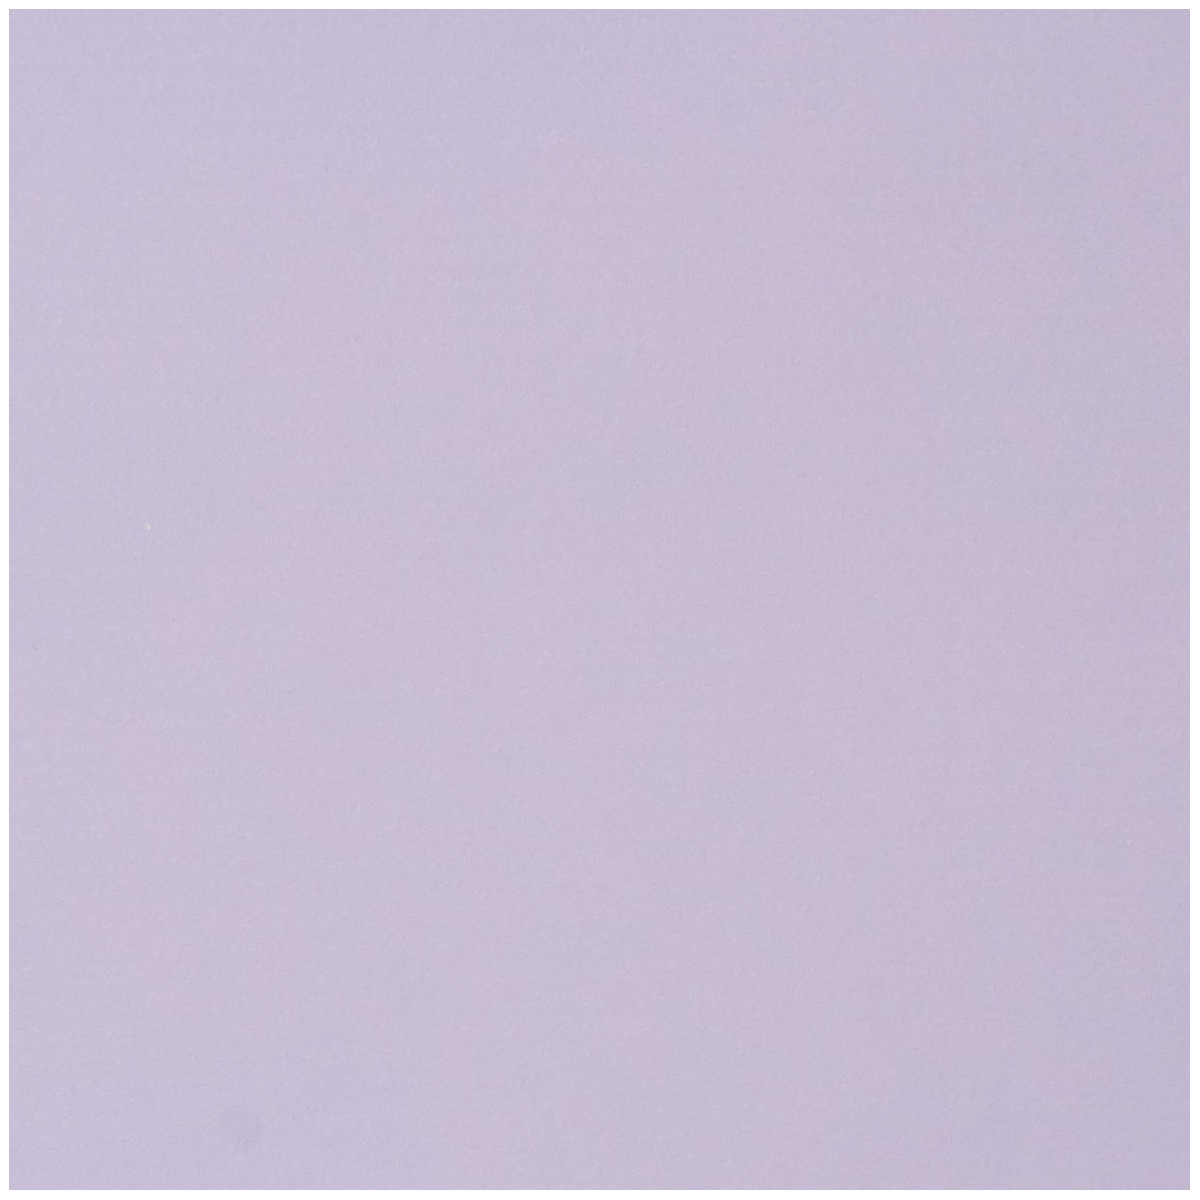 Carta Sealing Bianco ECOWHITE Gr.60 Fogli Cm.70x100 Colori Tinta Unita (al Kg.) Glicine